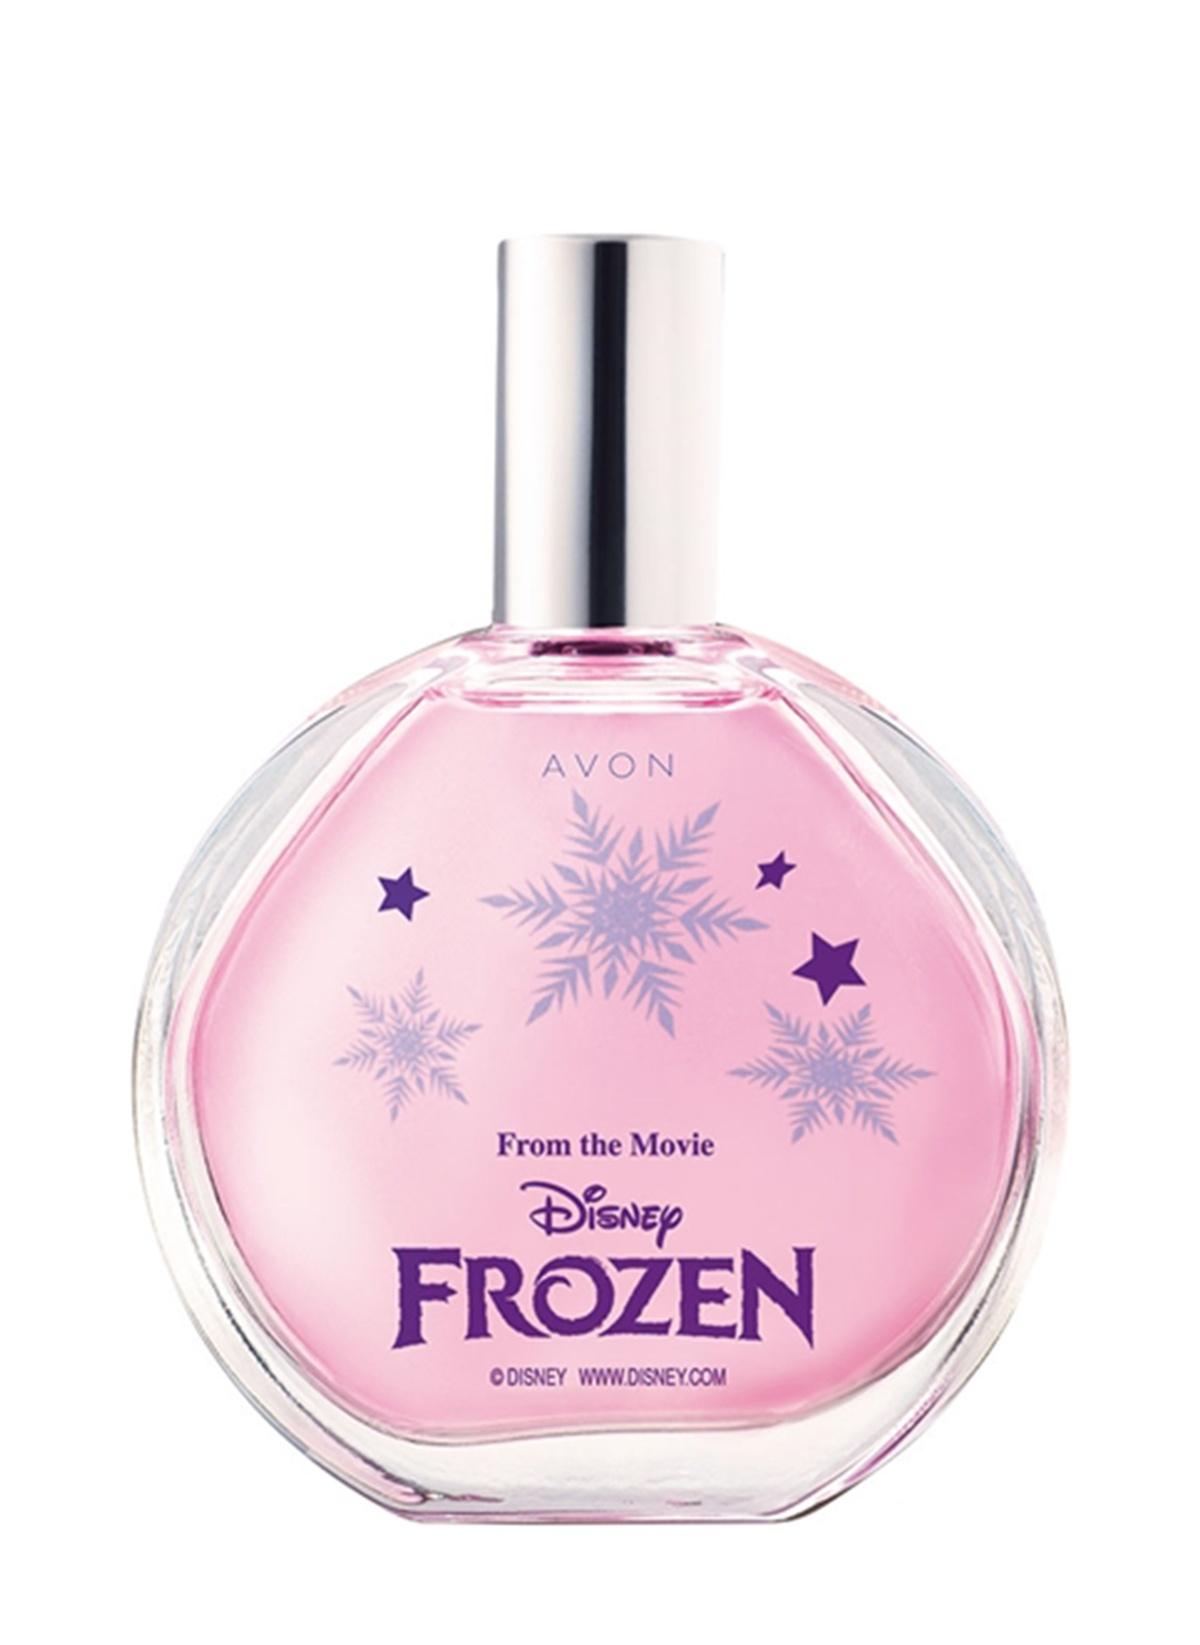 Disney avon ля рош позе косметика купить в краснодаре